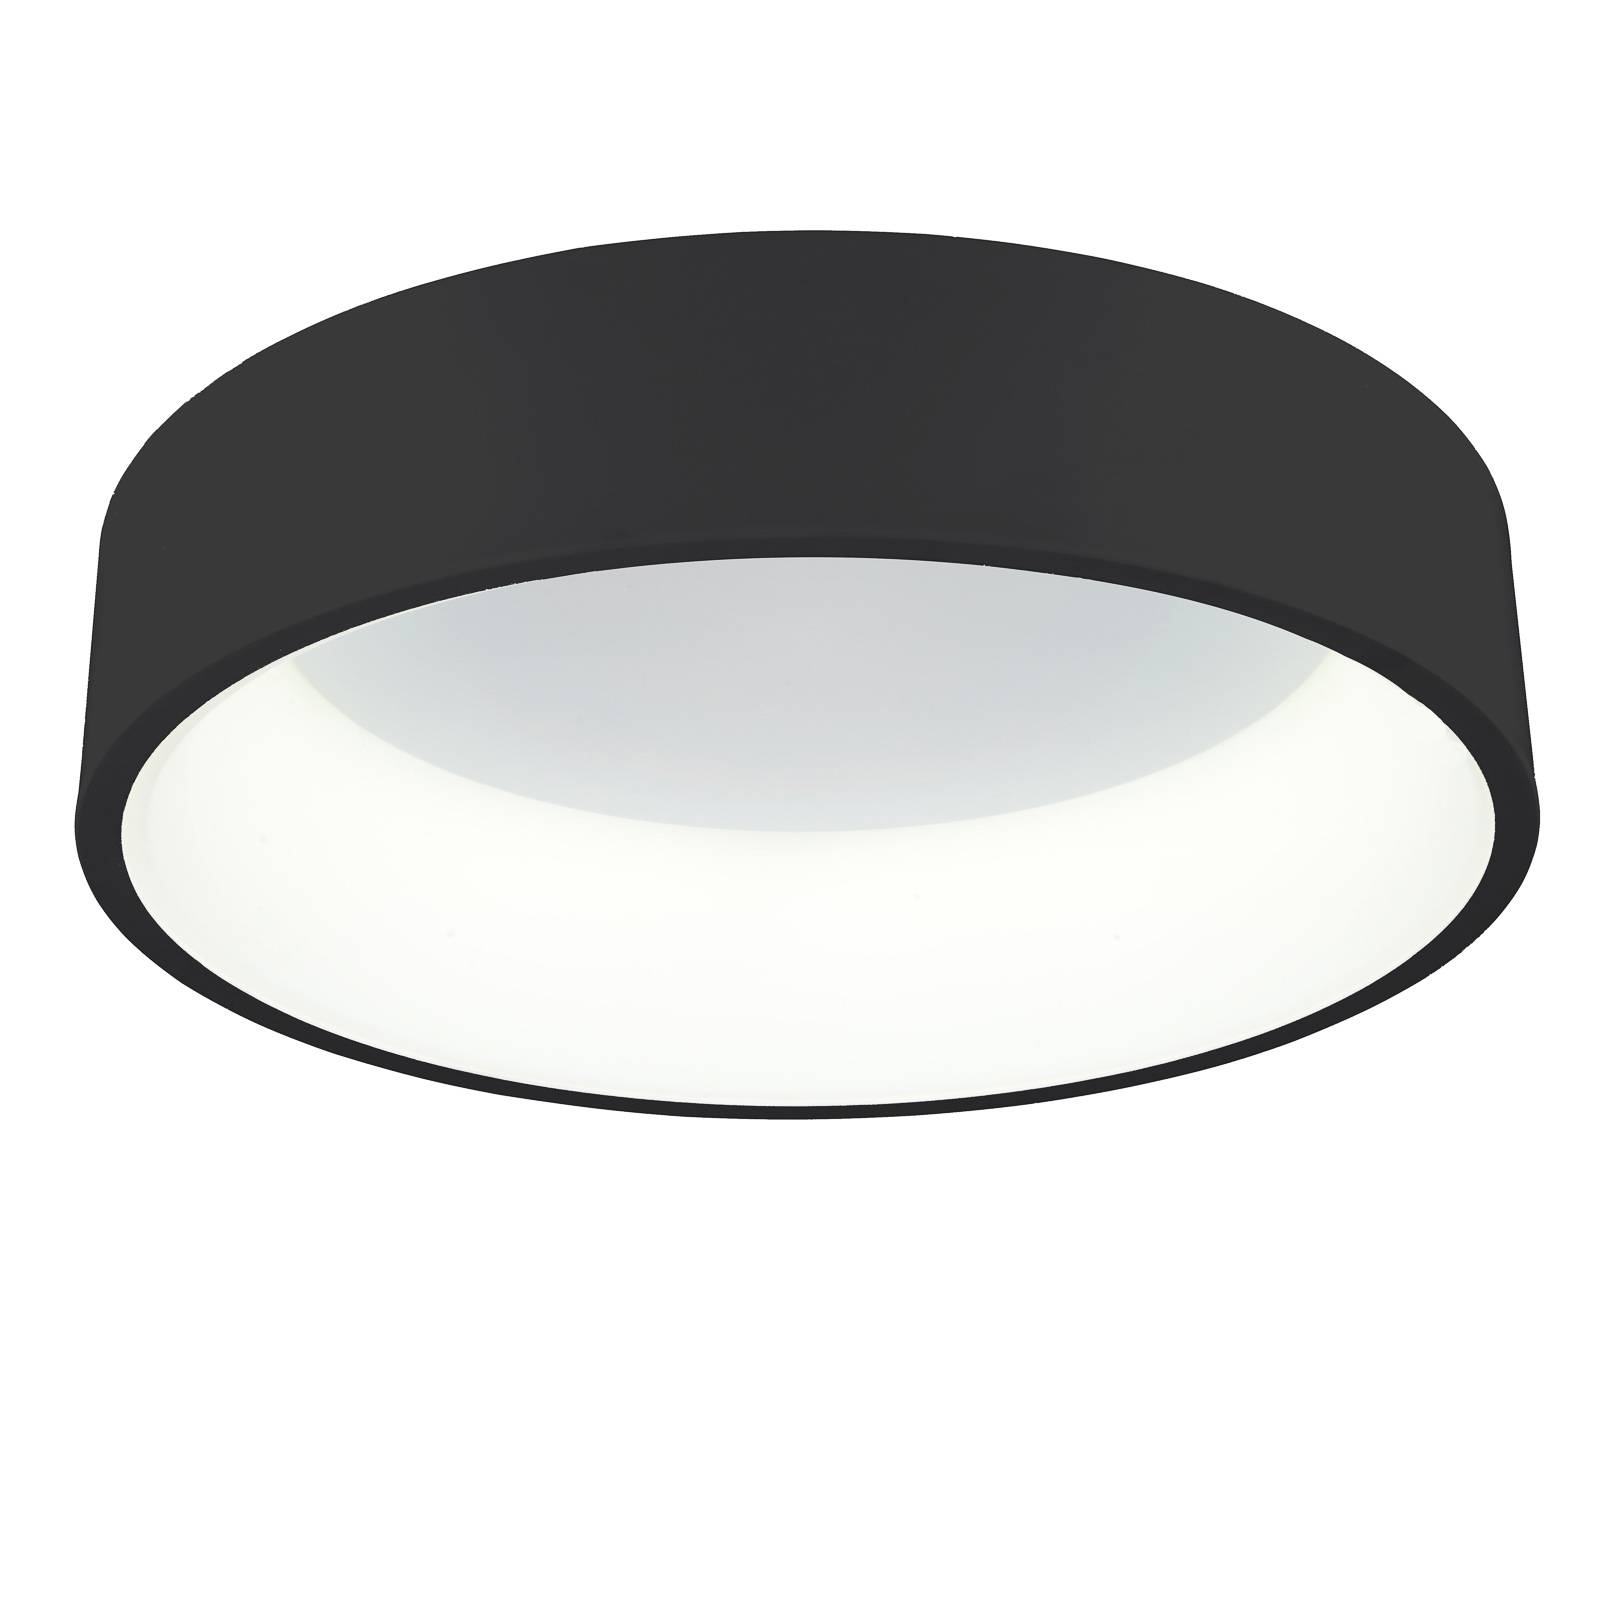 Arcchio Aleksi -LED-kattovalaisin, Ø 60 cm, pyöreä